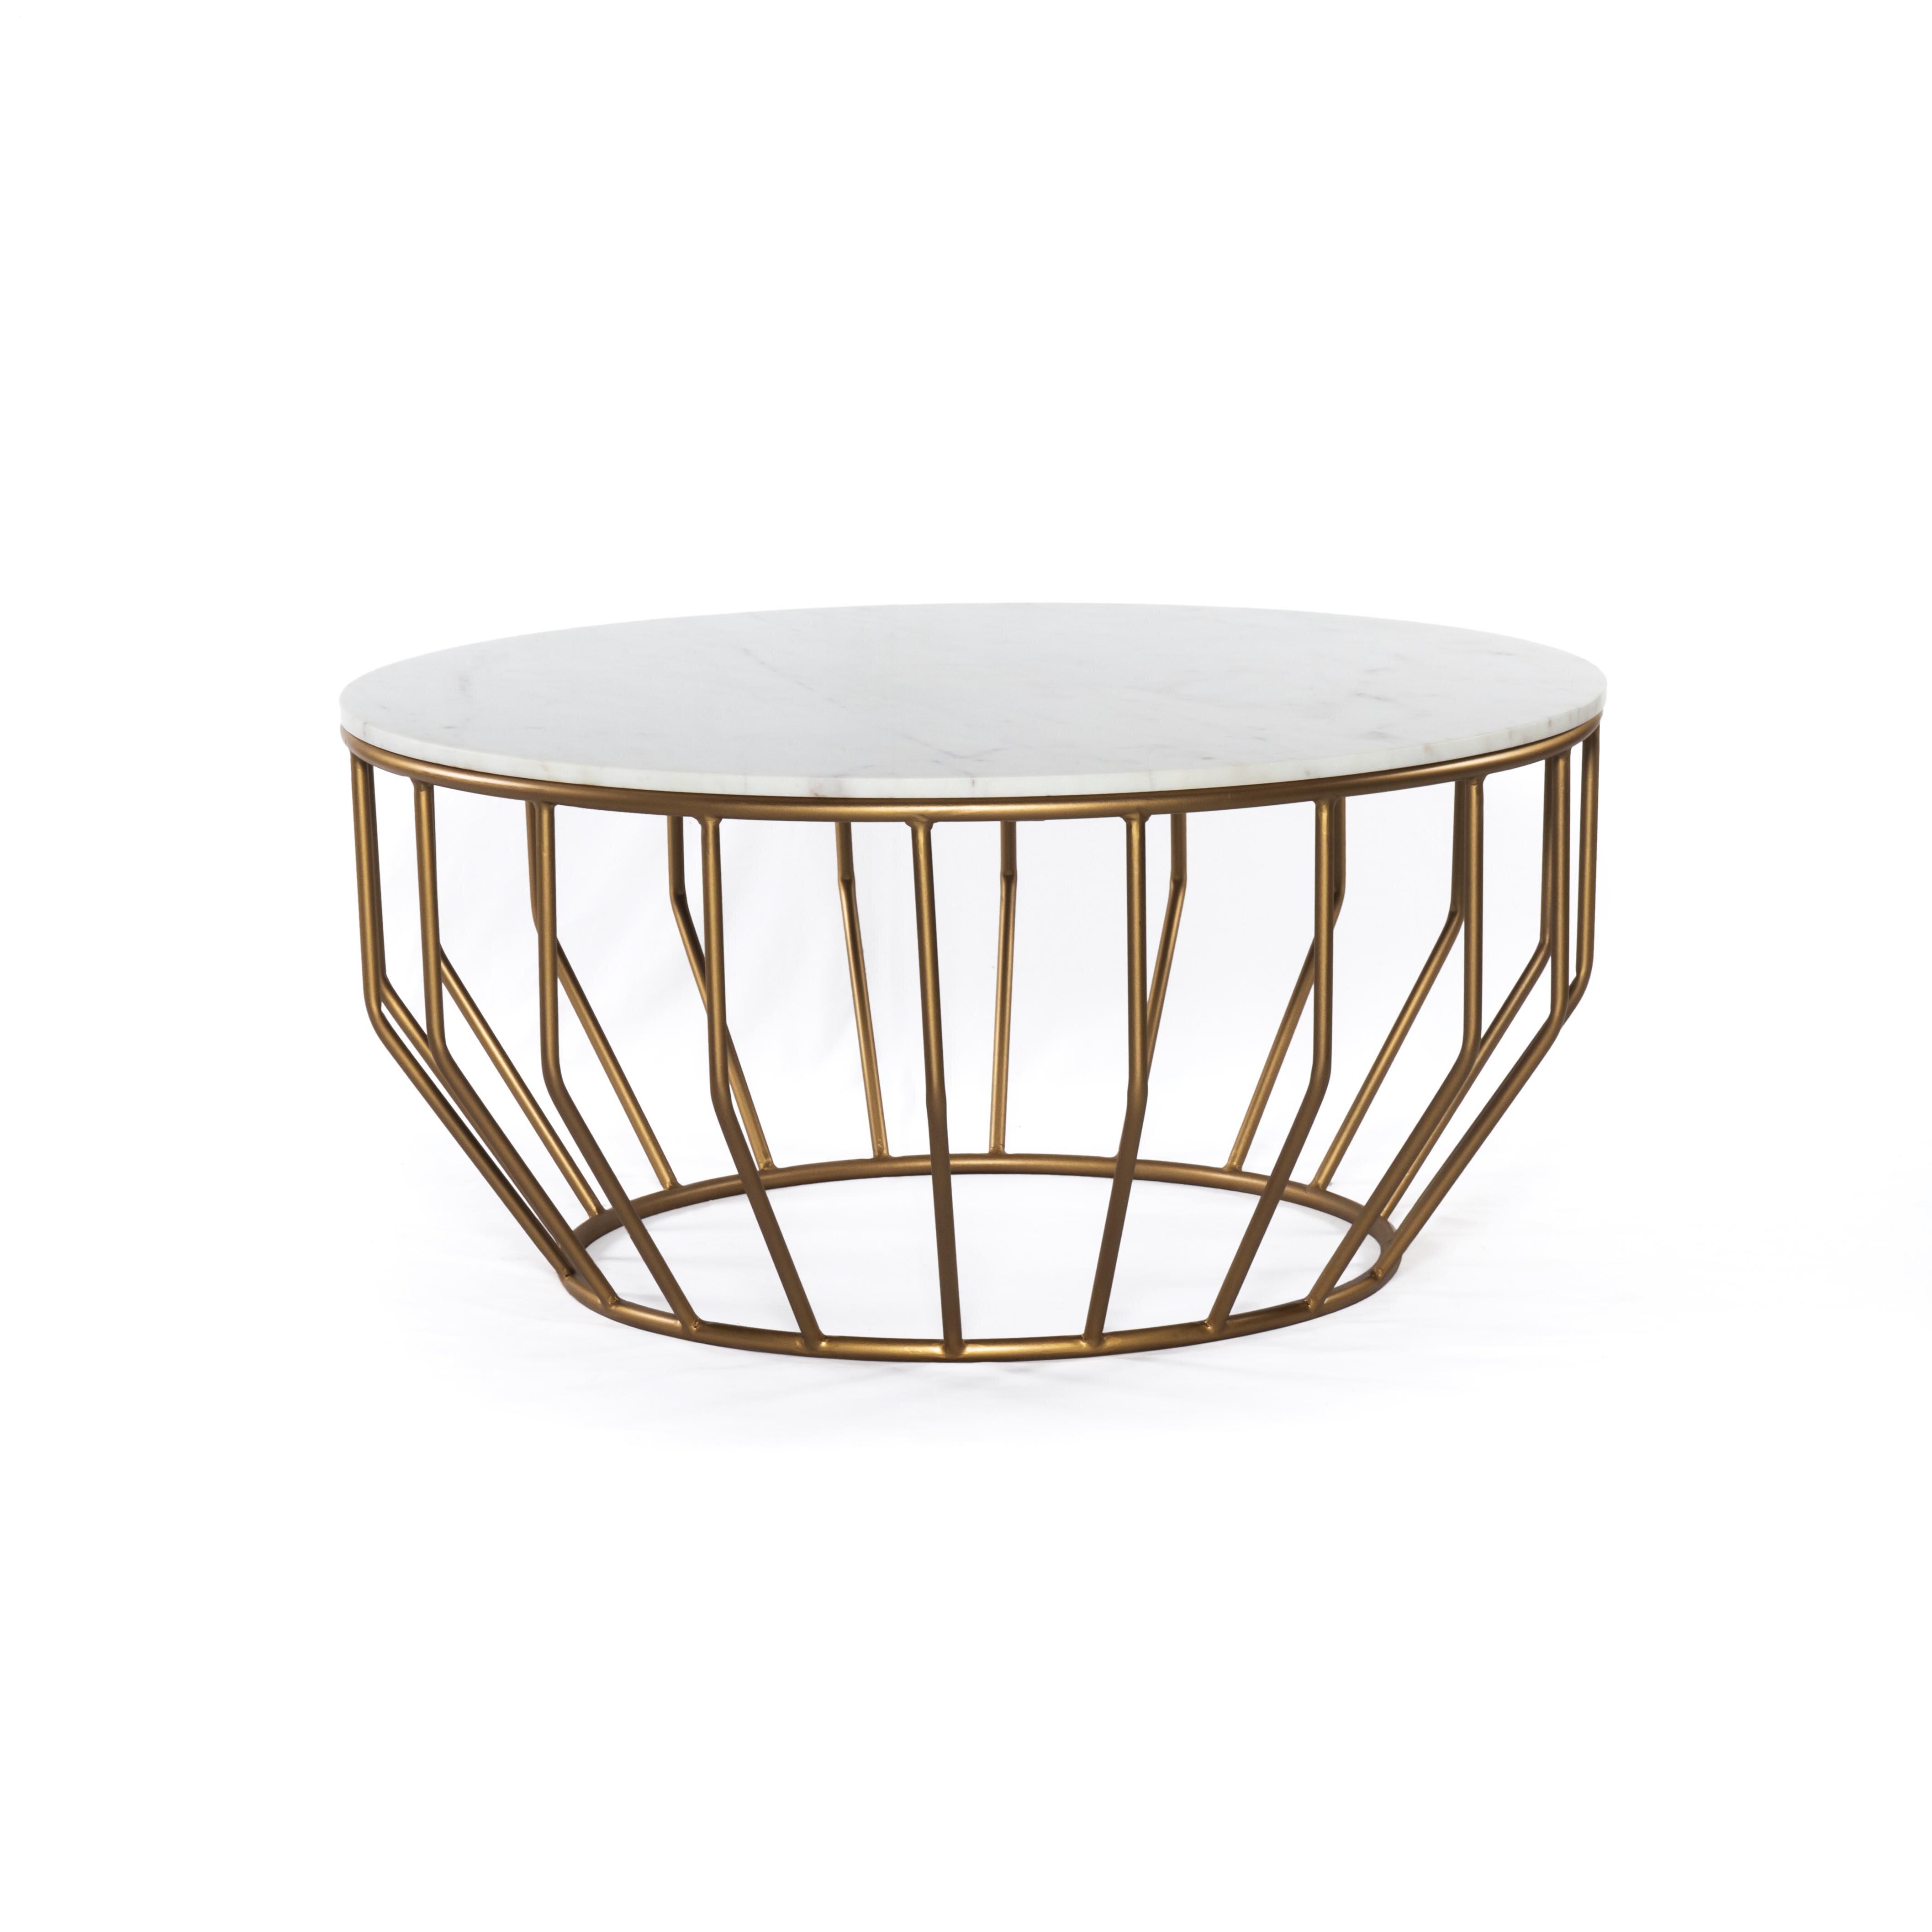 Tremendous Mercer41 Azuela Coffee Table Wayfair Andrewgaddart Wooden Chair Designs For Living Room Andrewgaddartcom